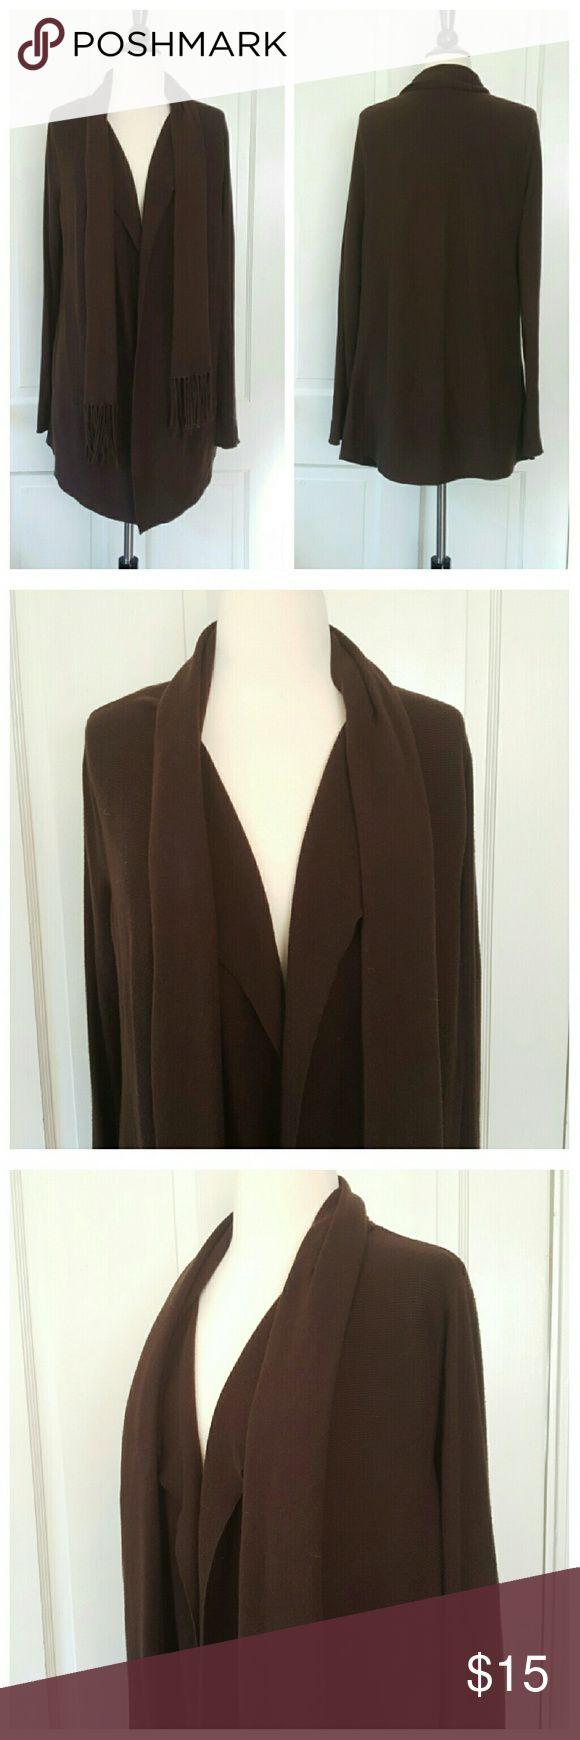 Adrianne Vittadini Brown Cardigan, attached scarf Adrienne Vittadini Brown Cardigan with attached scarf Adrienne Vittadini Sweaters Cardigans